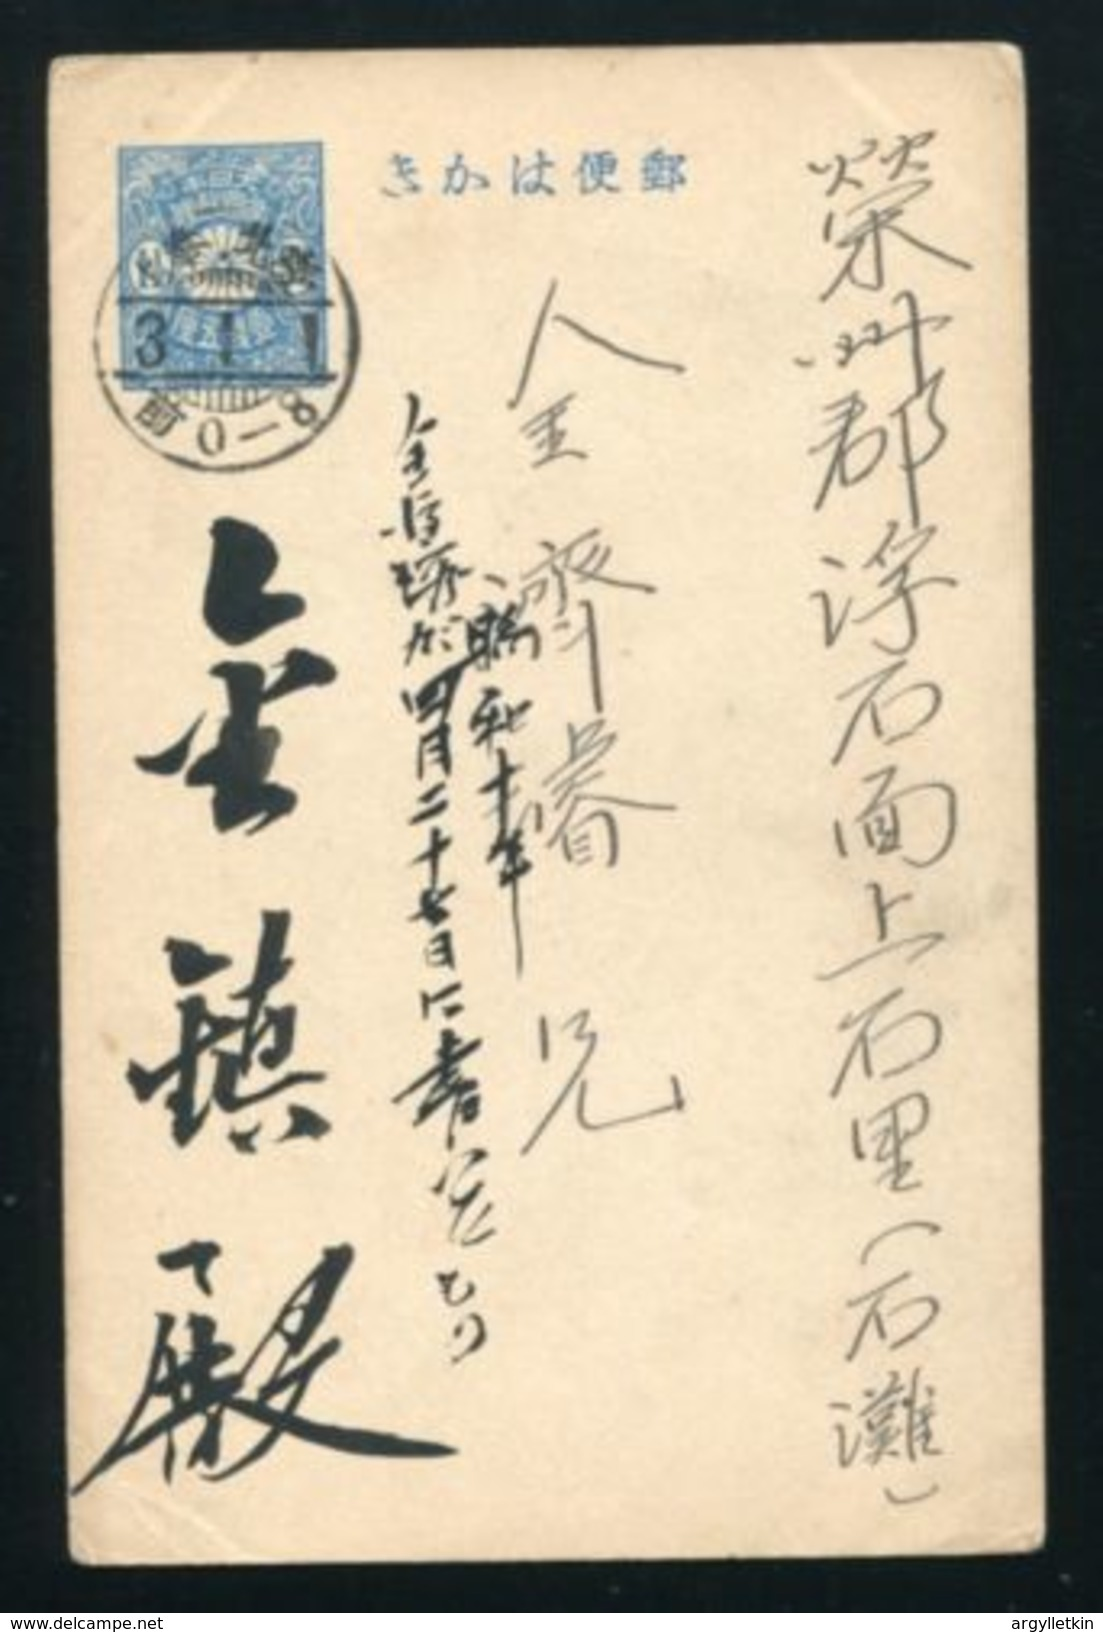 KOREA JAPAN 1925 STATIONERY KYONG BUK BUNG SAN - Korea (...-1945)